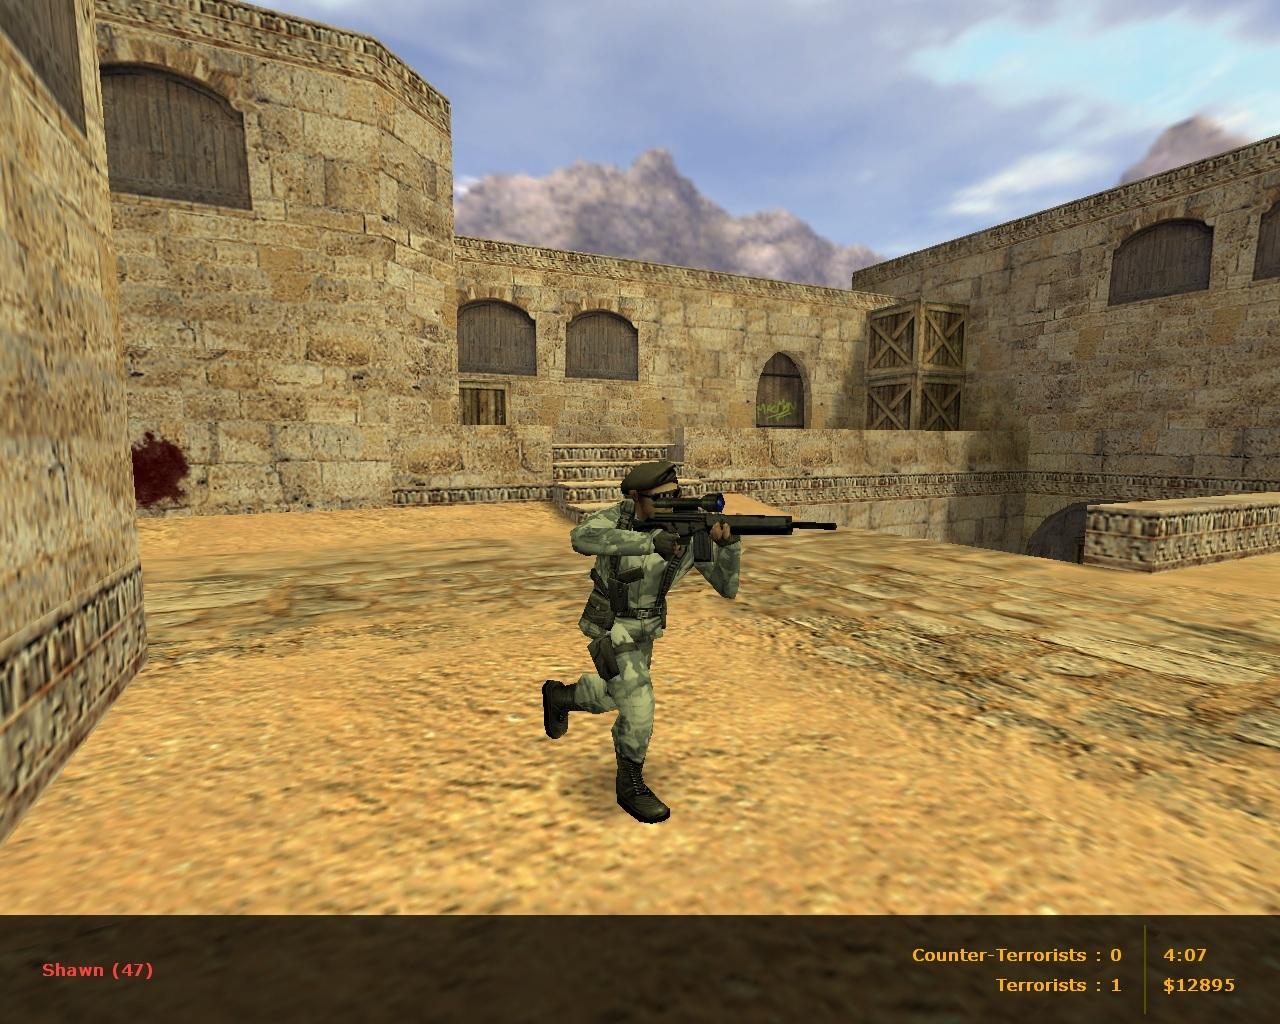 Download Counter-Strike 1.6: cs 1.6 download torent tpb